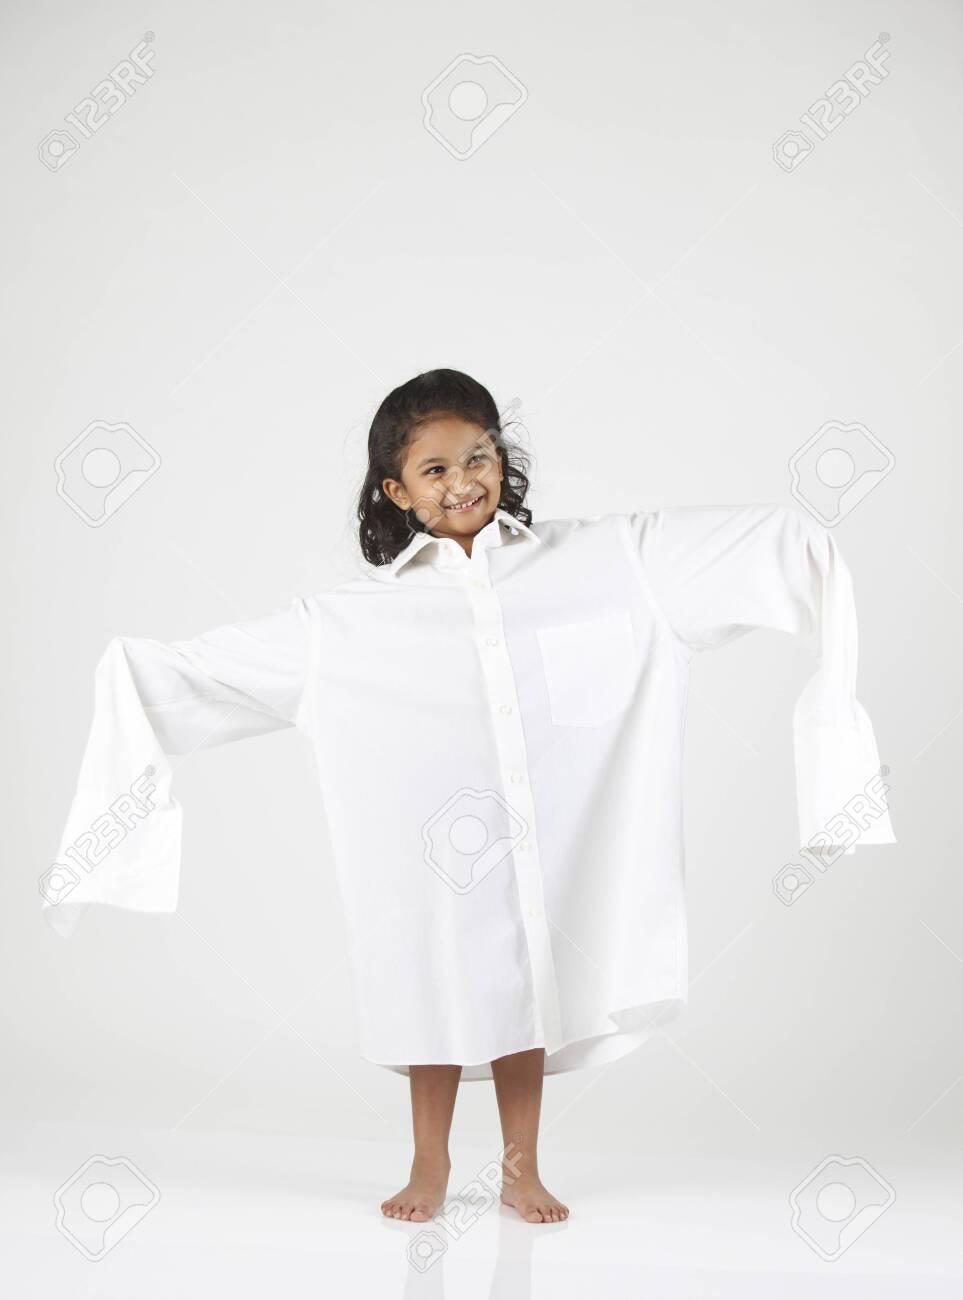 oversized shirt kids